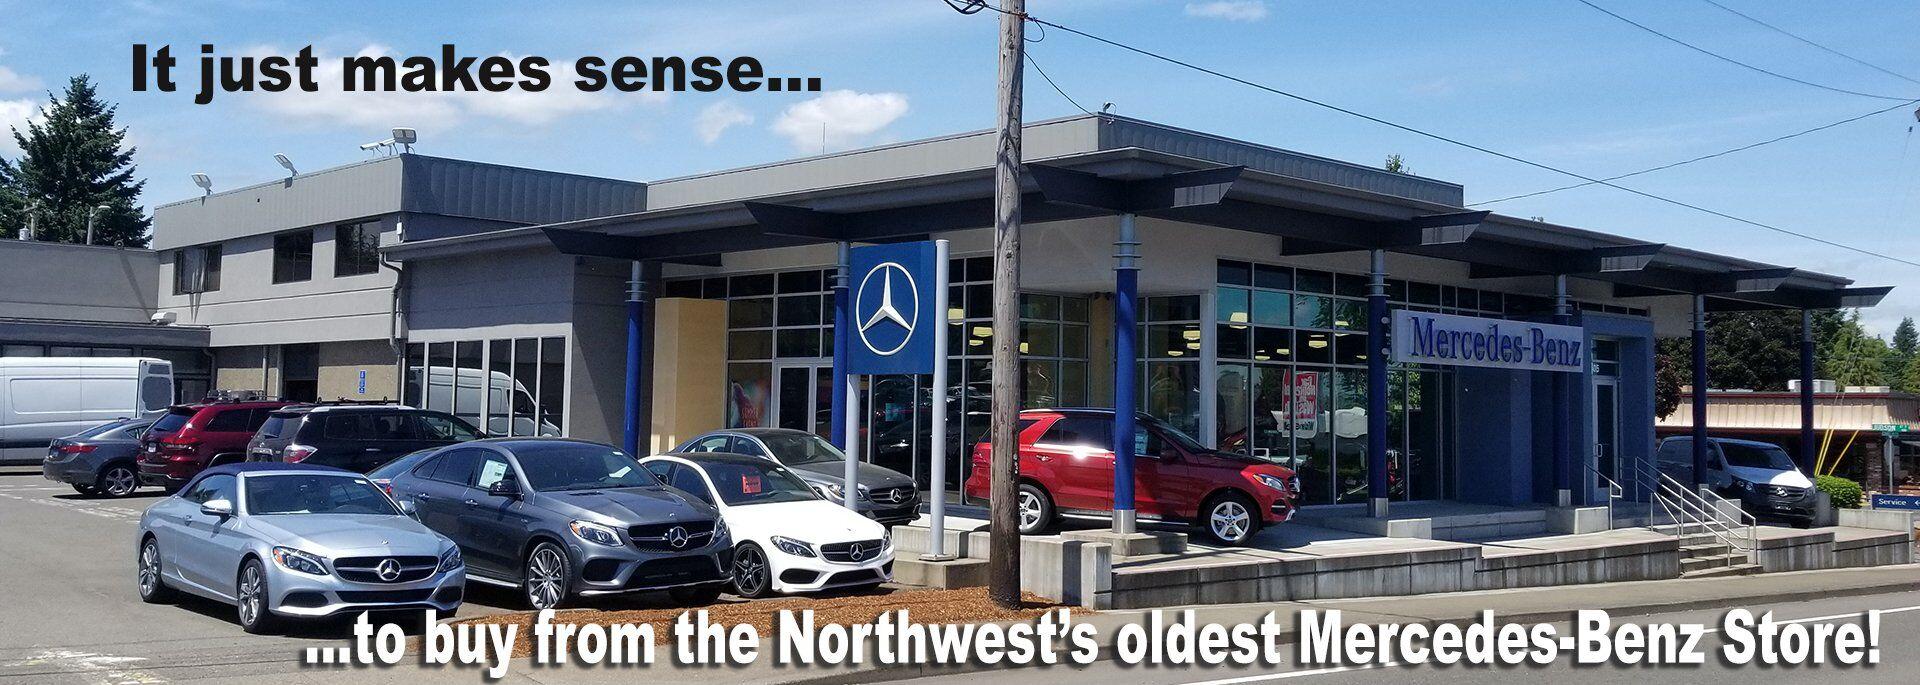 Mercedes Benz Dealership >> Mercedes Benz Dealership Salem Or Used Cars Mercedes Benz